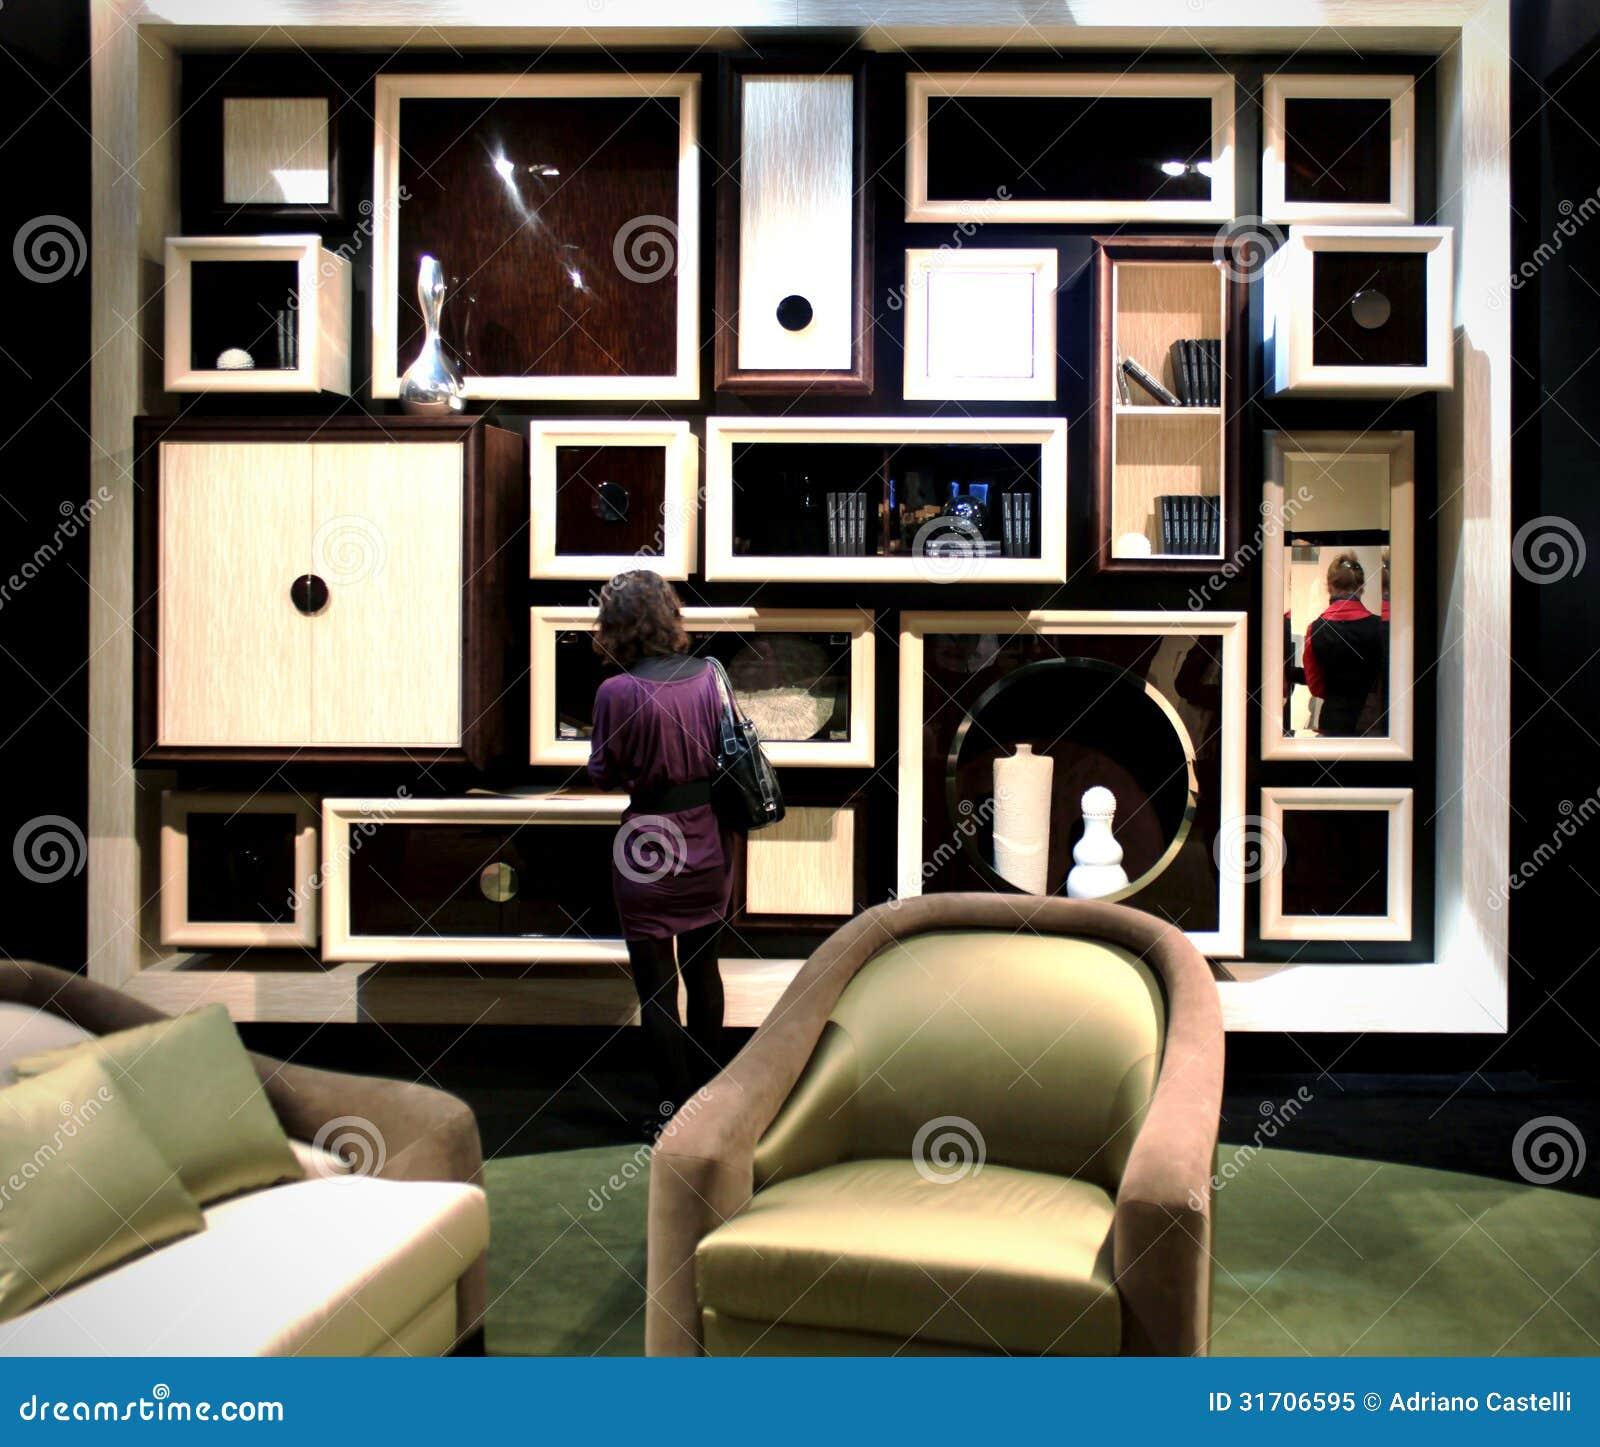 Salone del mobile editorial image image 31706595 for Interior design solutions